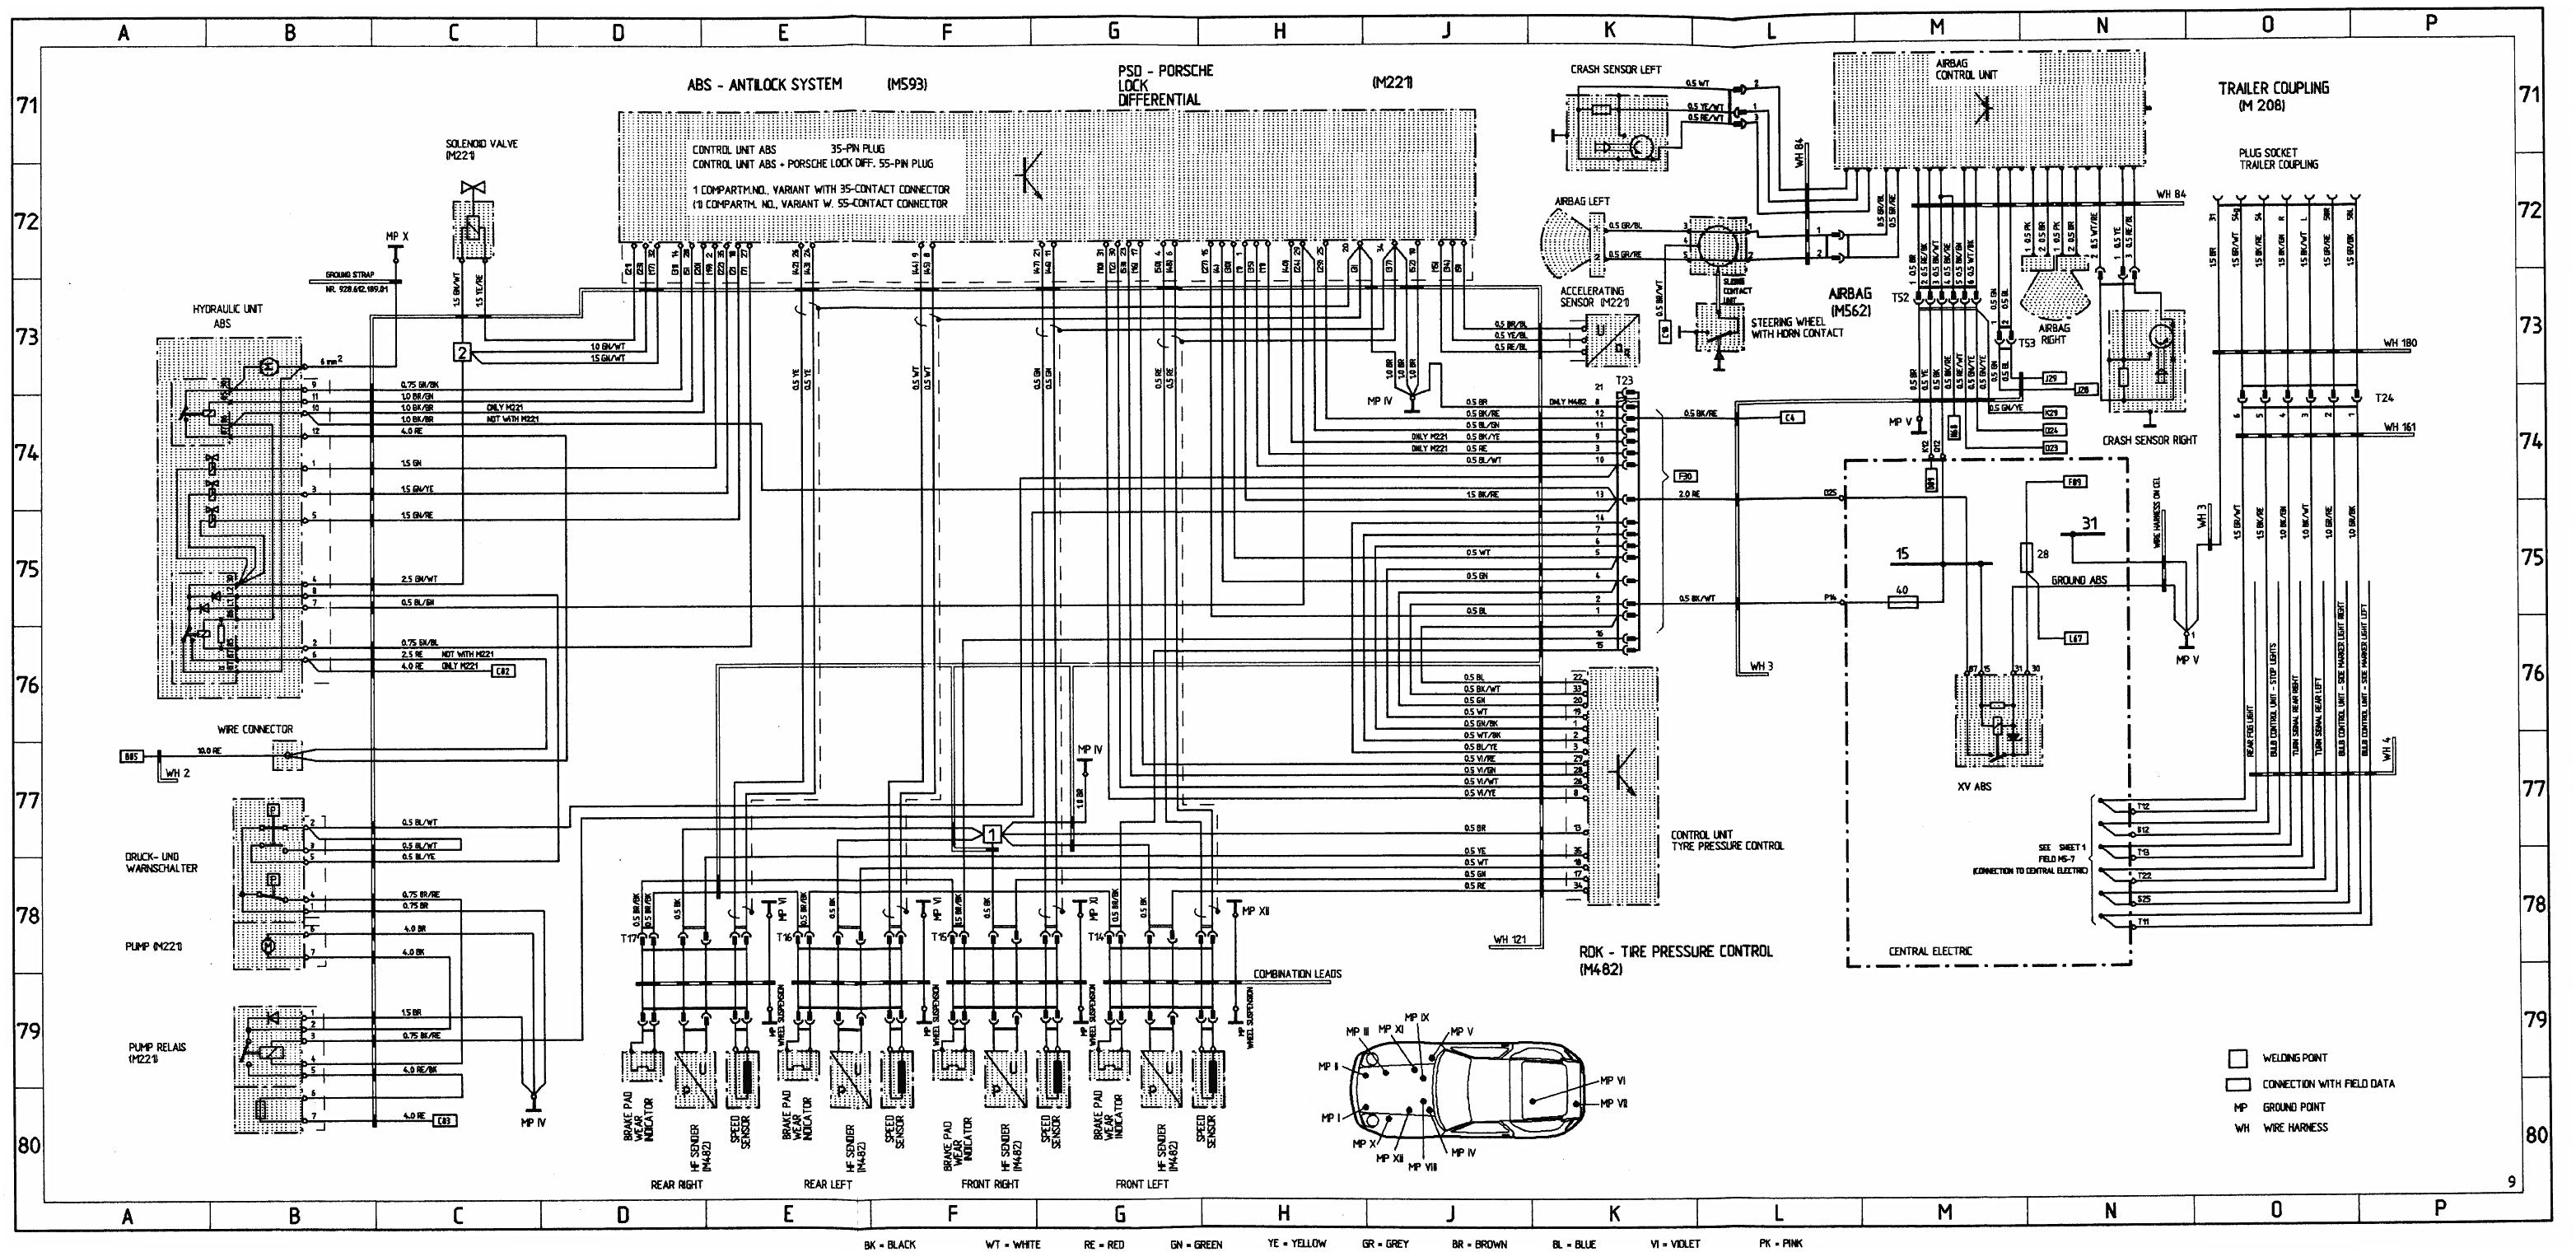 bmw wiring diagram e46 wiring diagram paper wiring diagram for bmw 318i e46 bmw wiring diagram